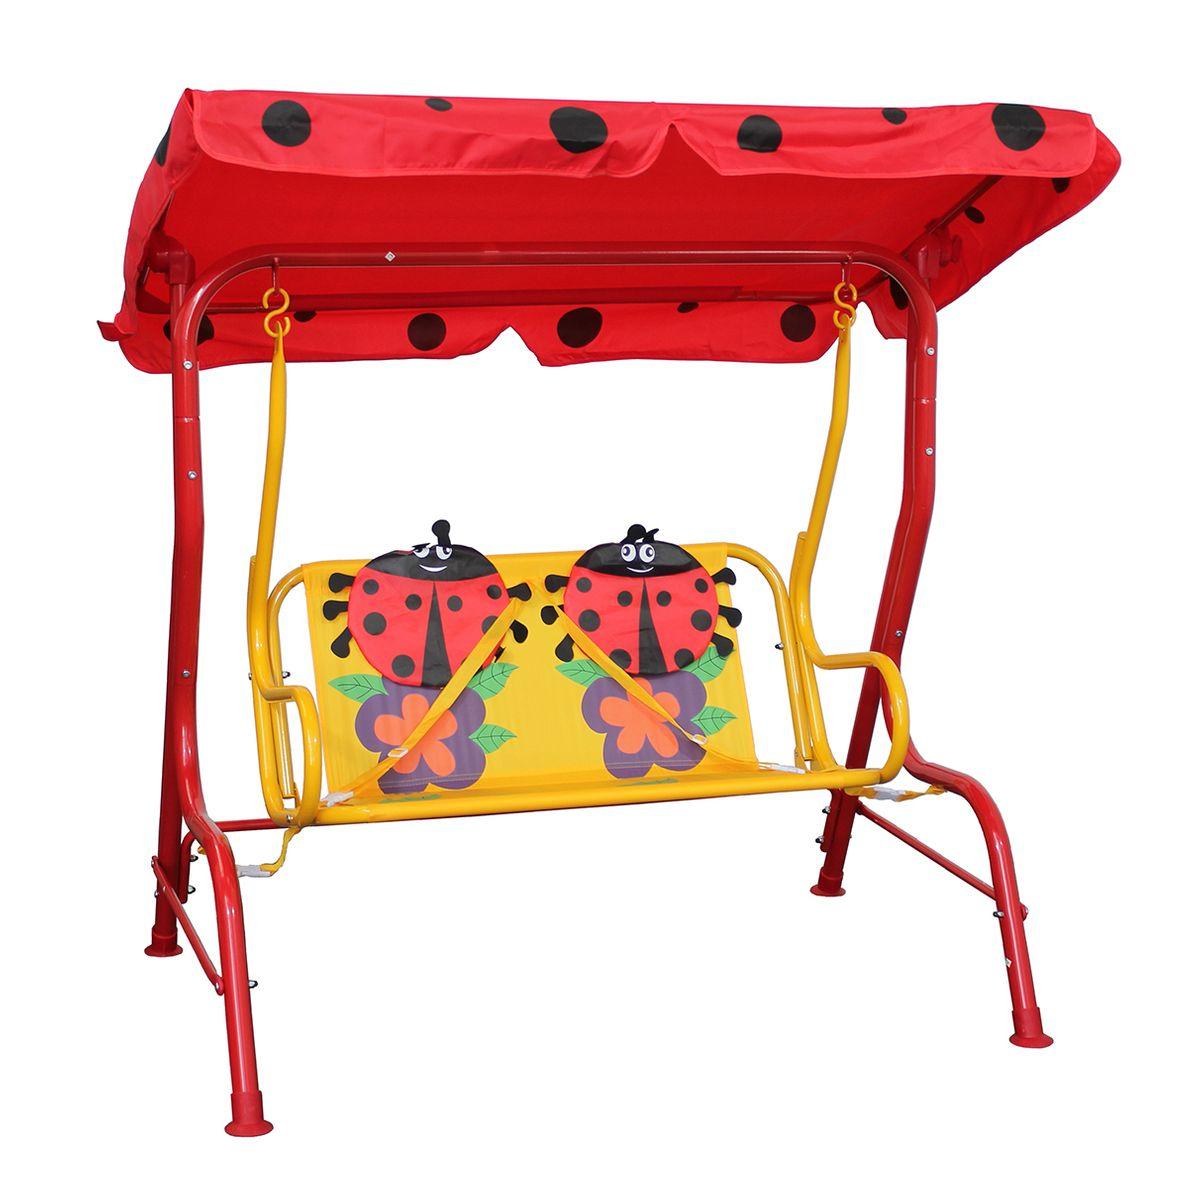 kinder hollywoodschaukel kinderschaukel gartenschaukel. Black Bedroom Furniture Sets. Home Design Ideas